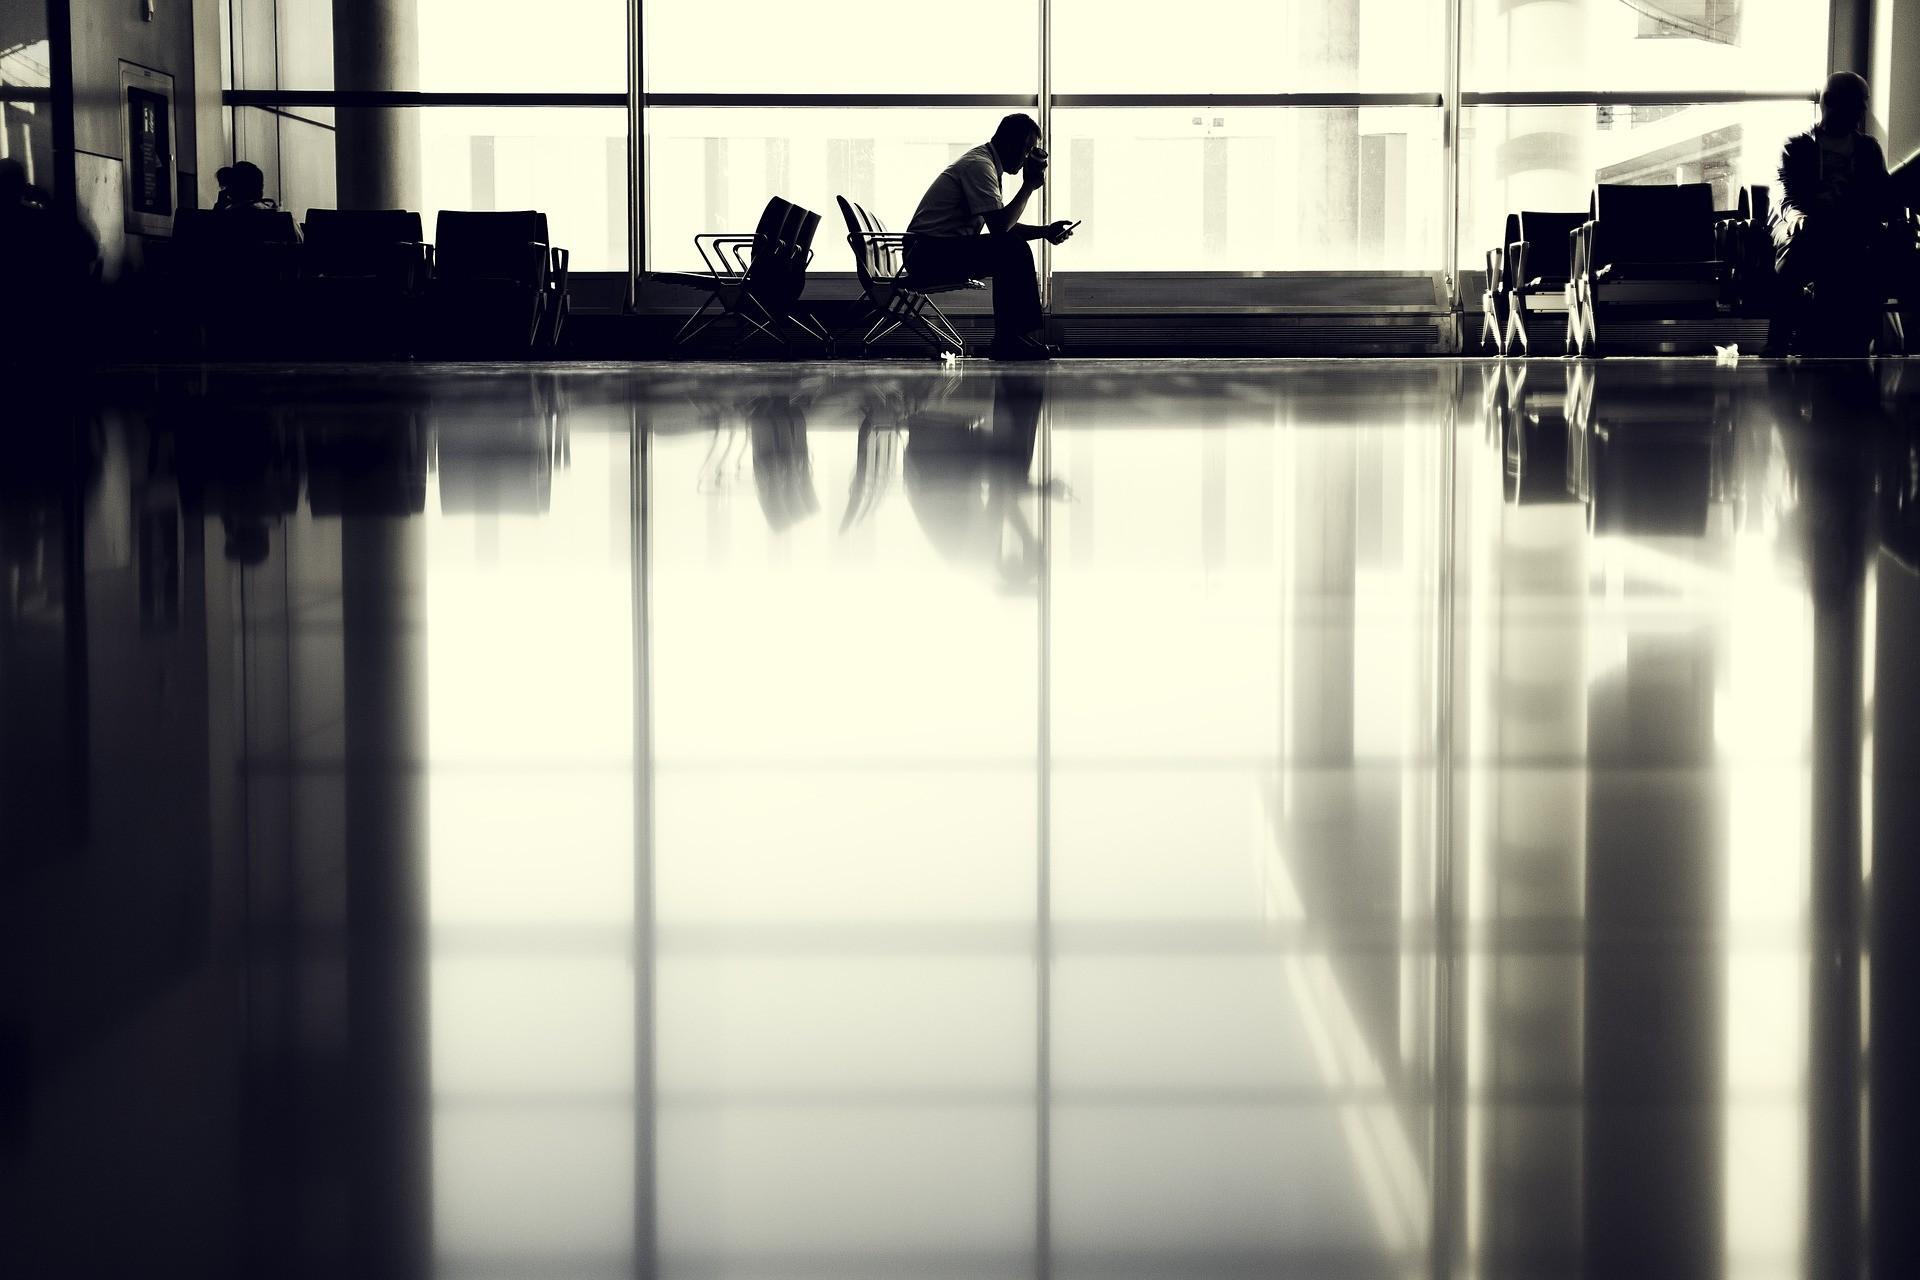 Lotnisko terminal